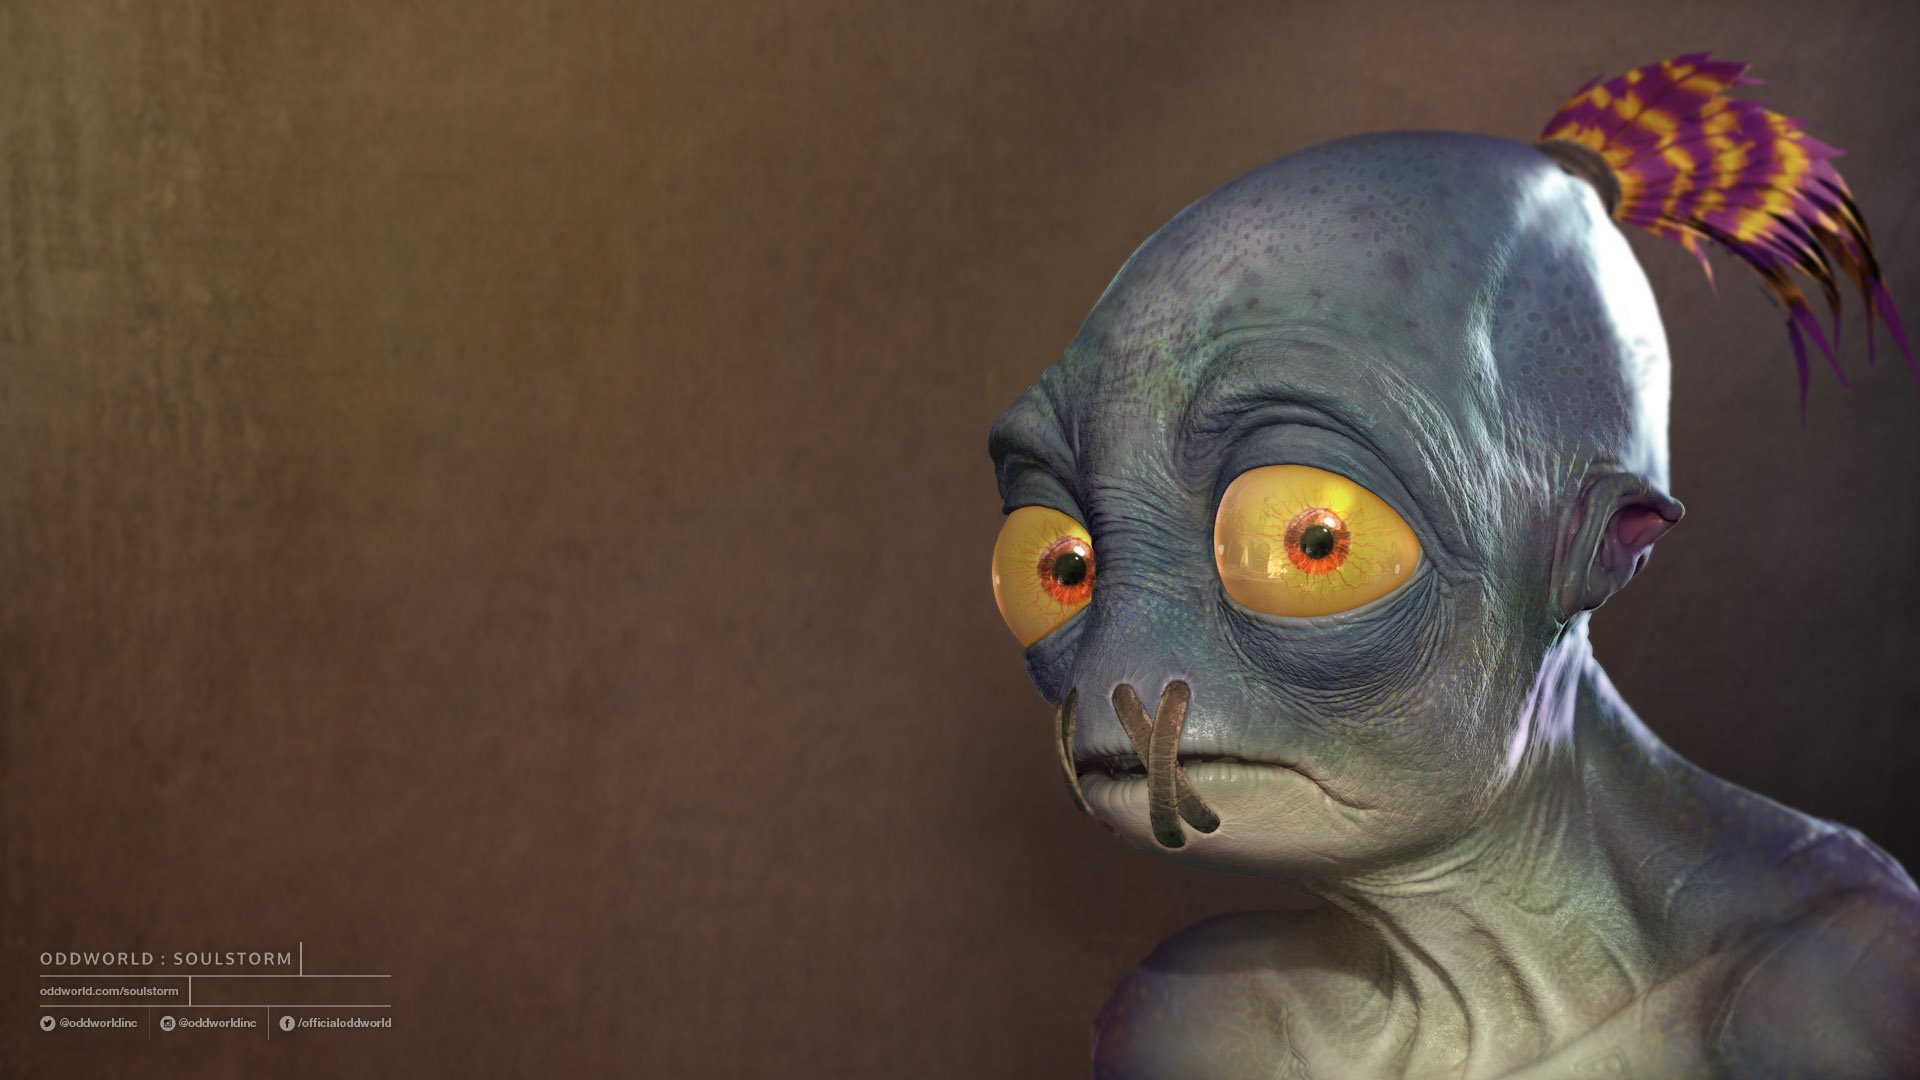 Lorne Lanning Shacknews Interview - Oddworld Soulstorm Abe concept art